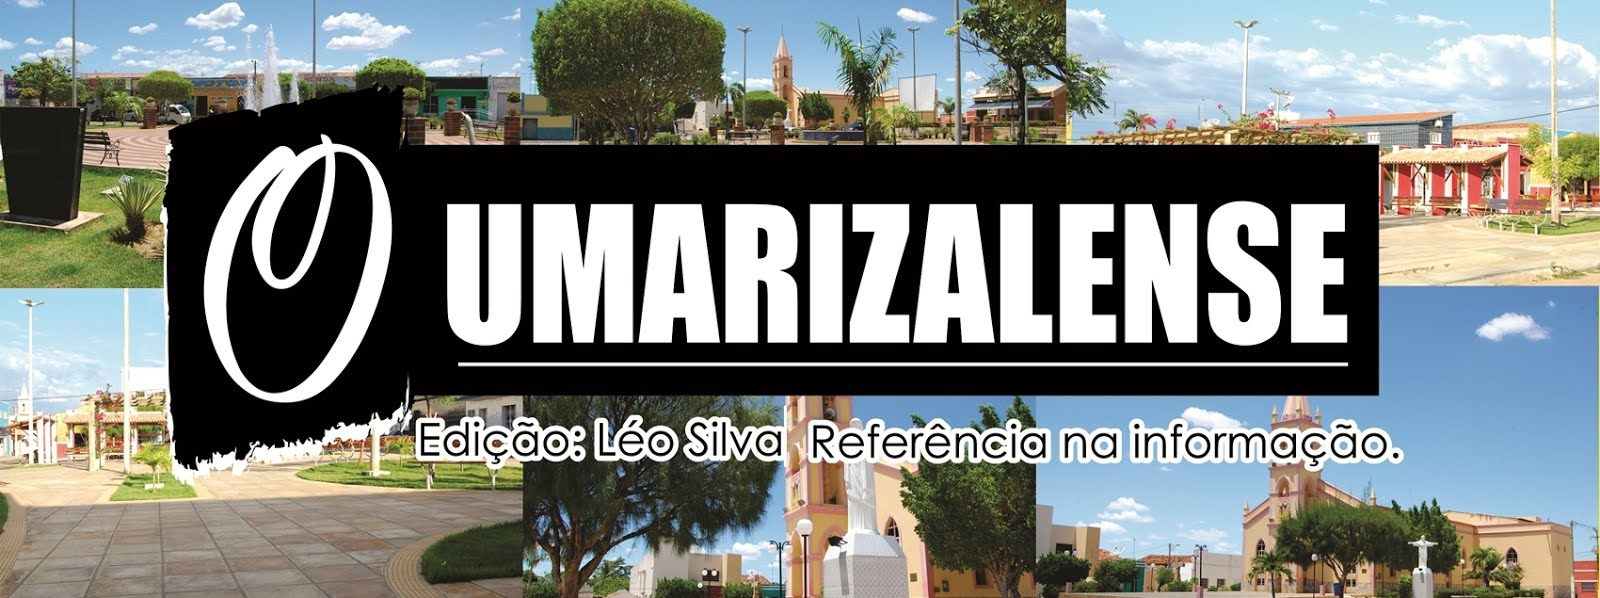 O Umarizalense